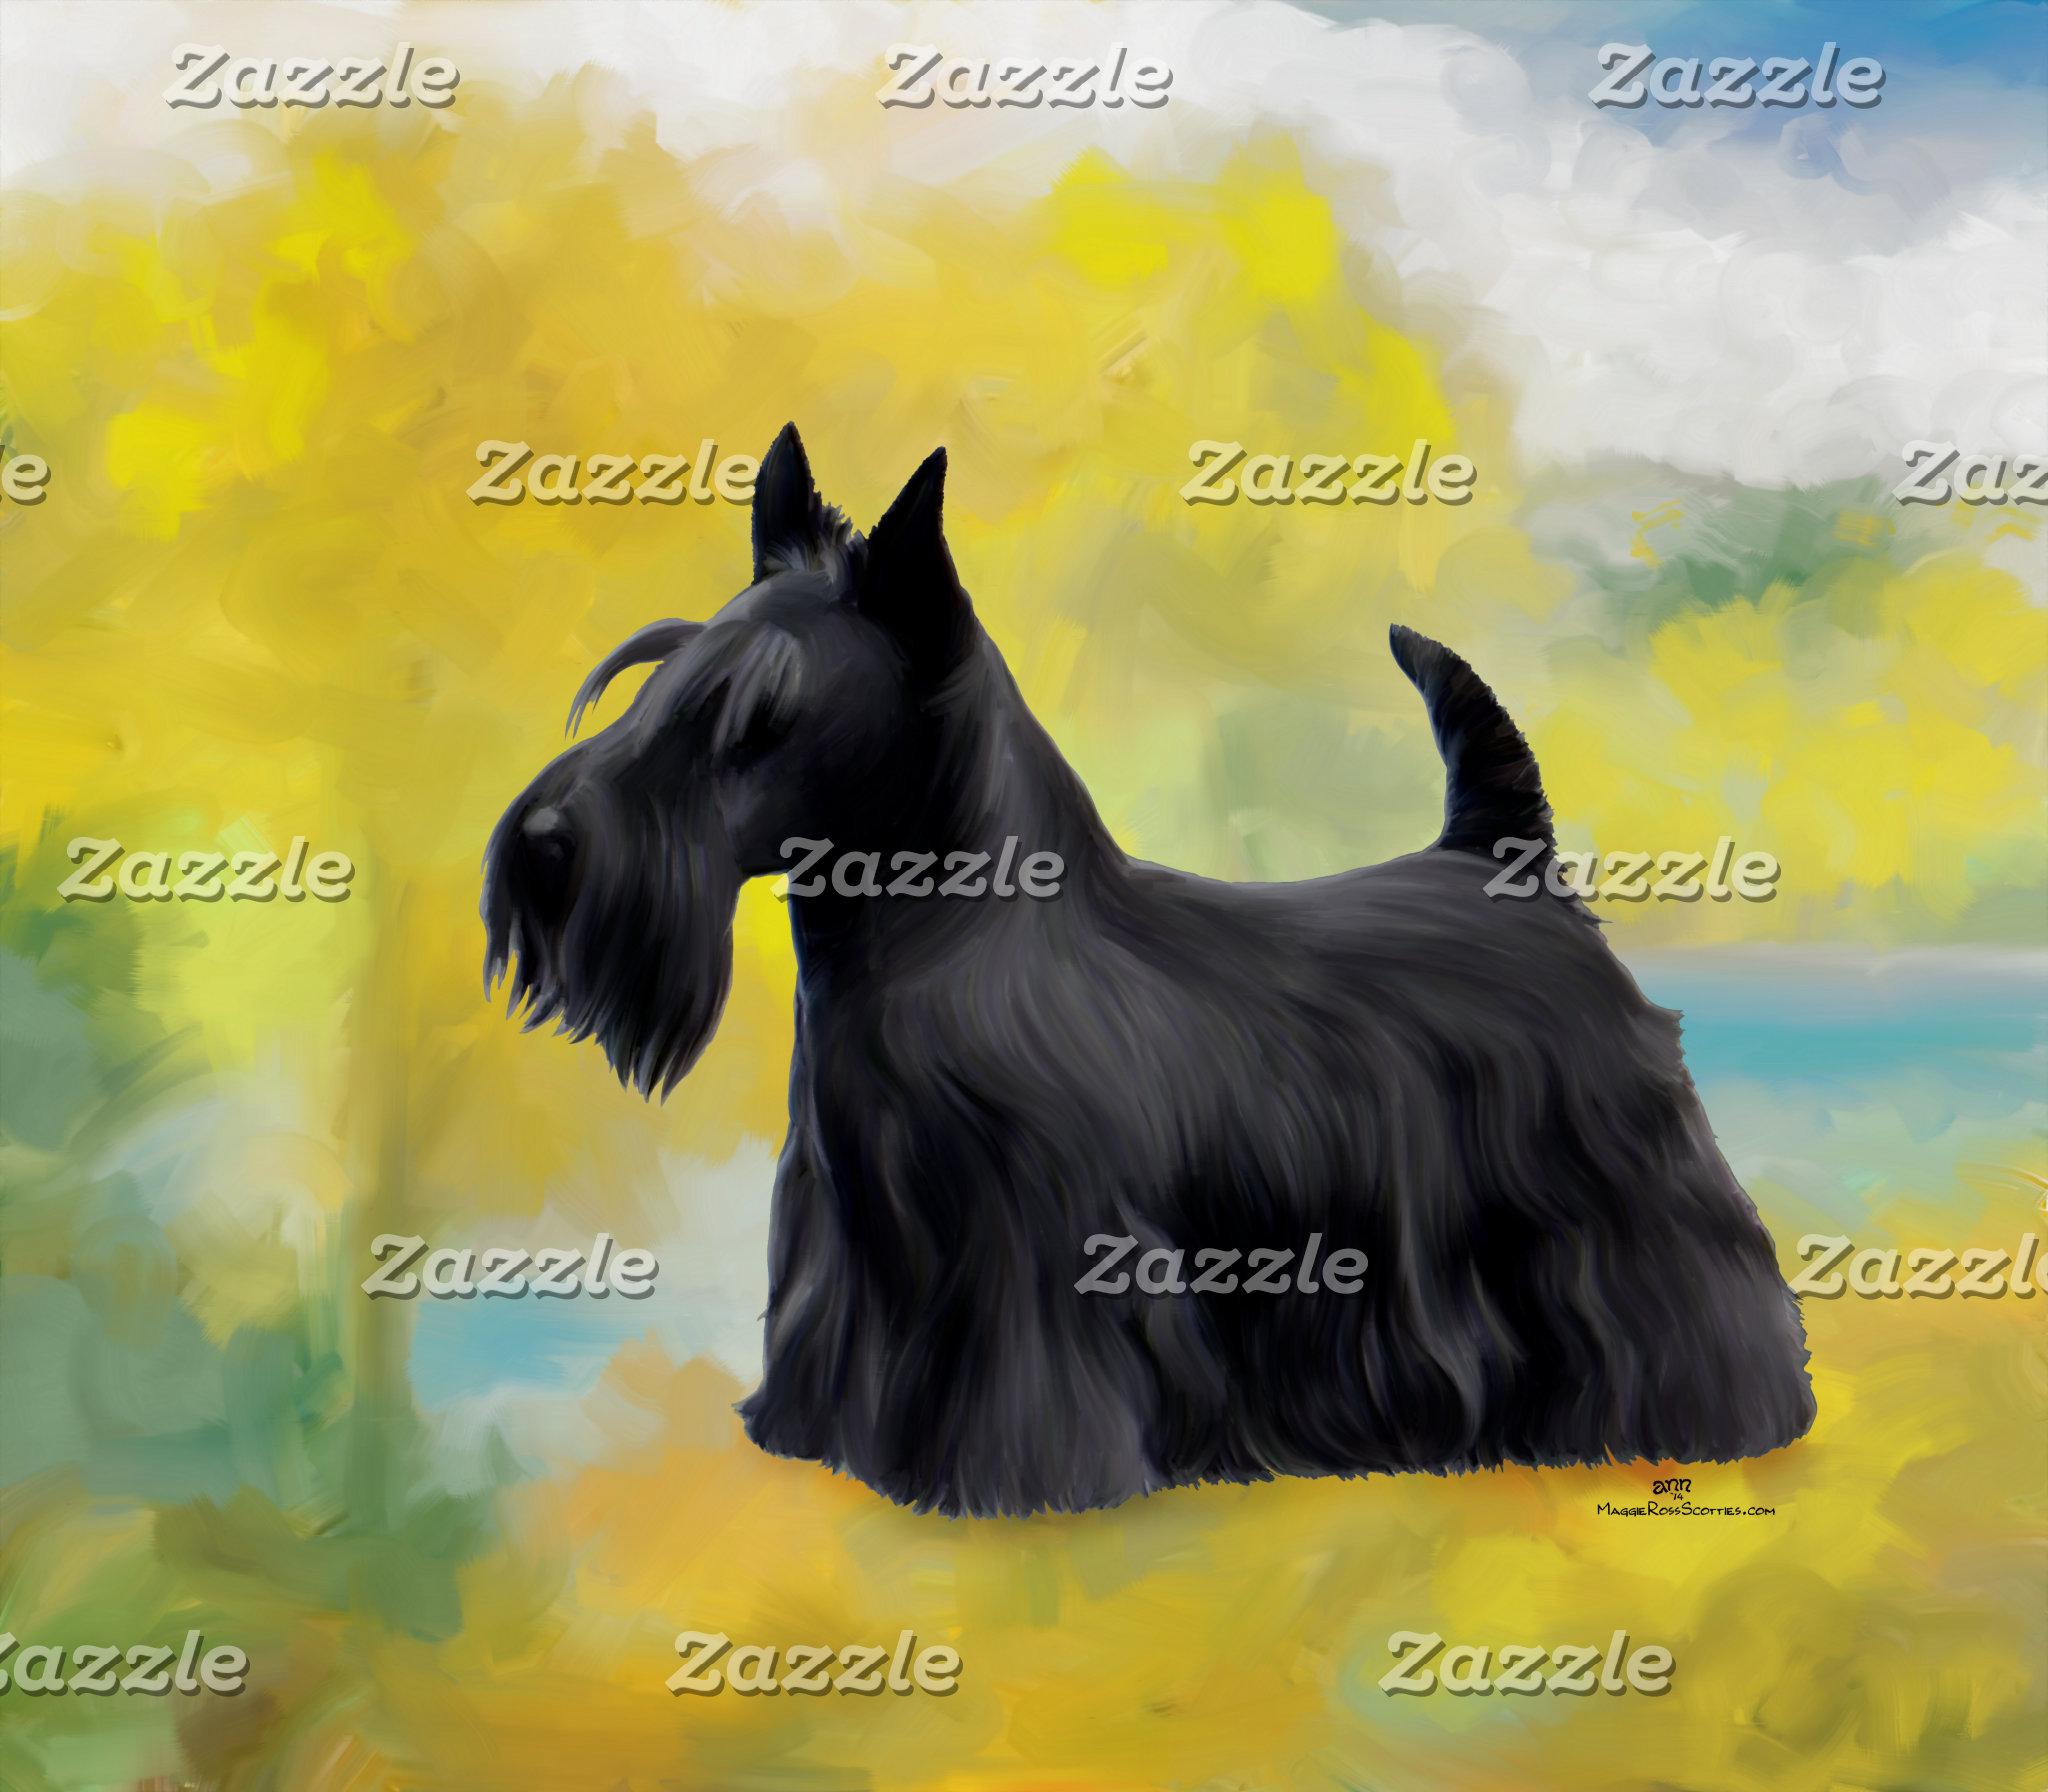 12 Scottish Terriers